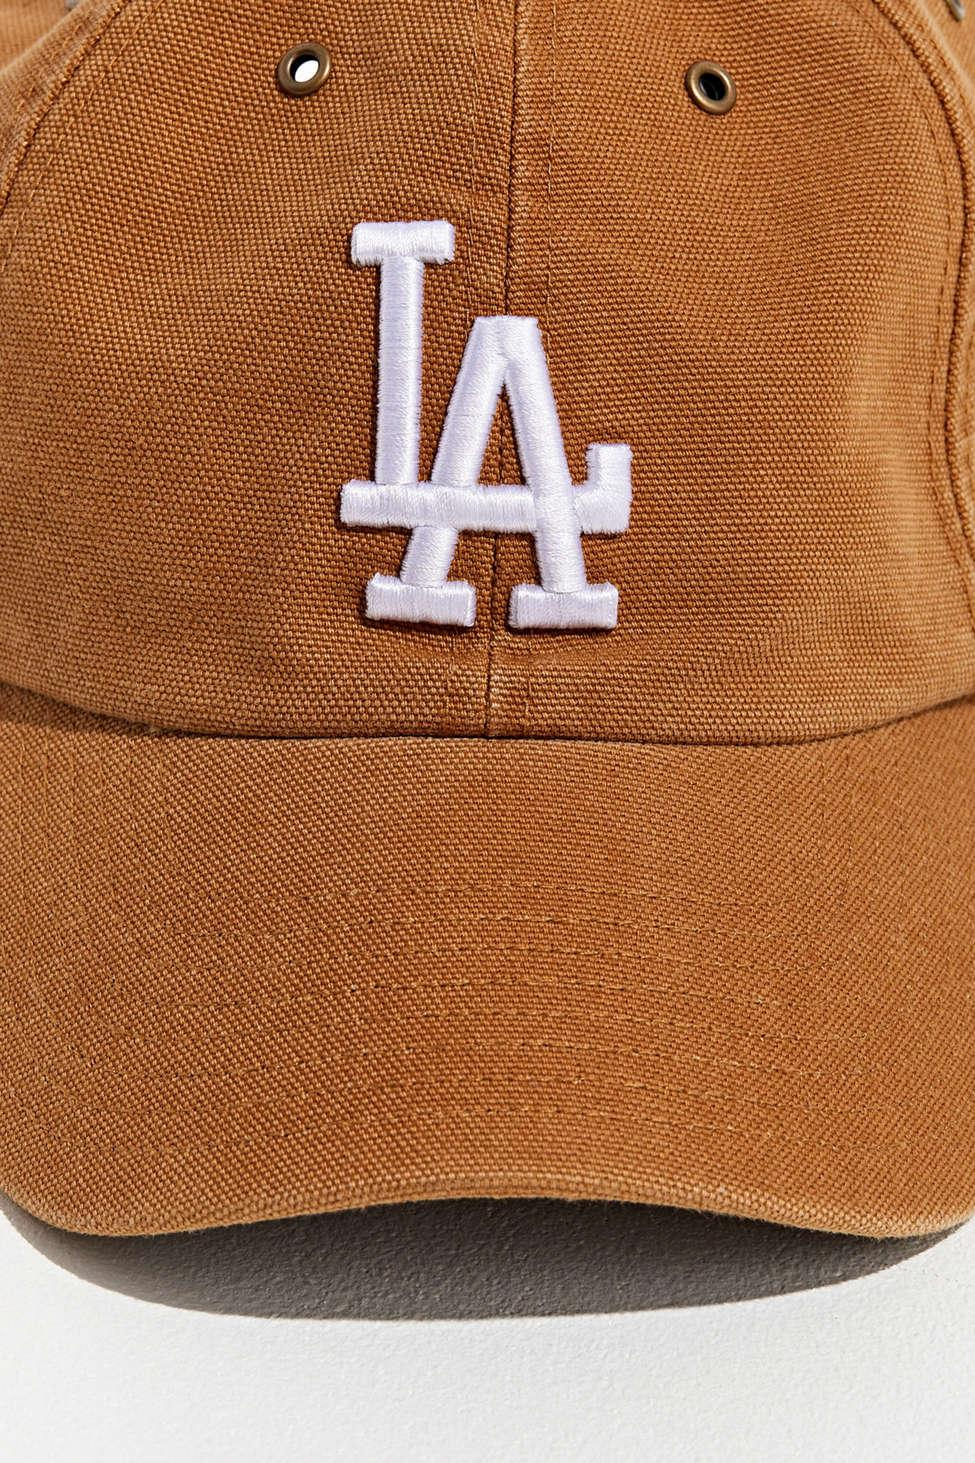 f0c922ec 47 Brand Natural X Carhartt Los Angeles Dodgers Dad Baseball Hat for men